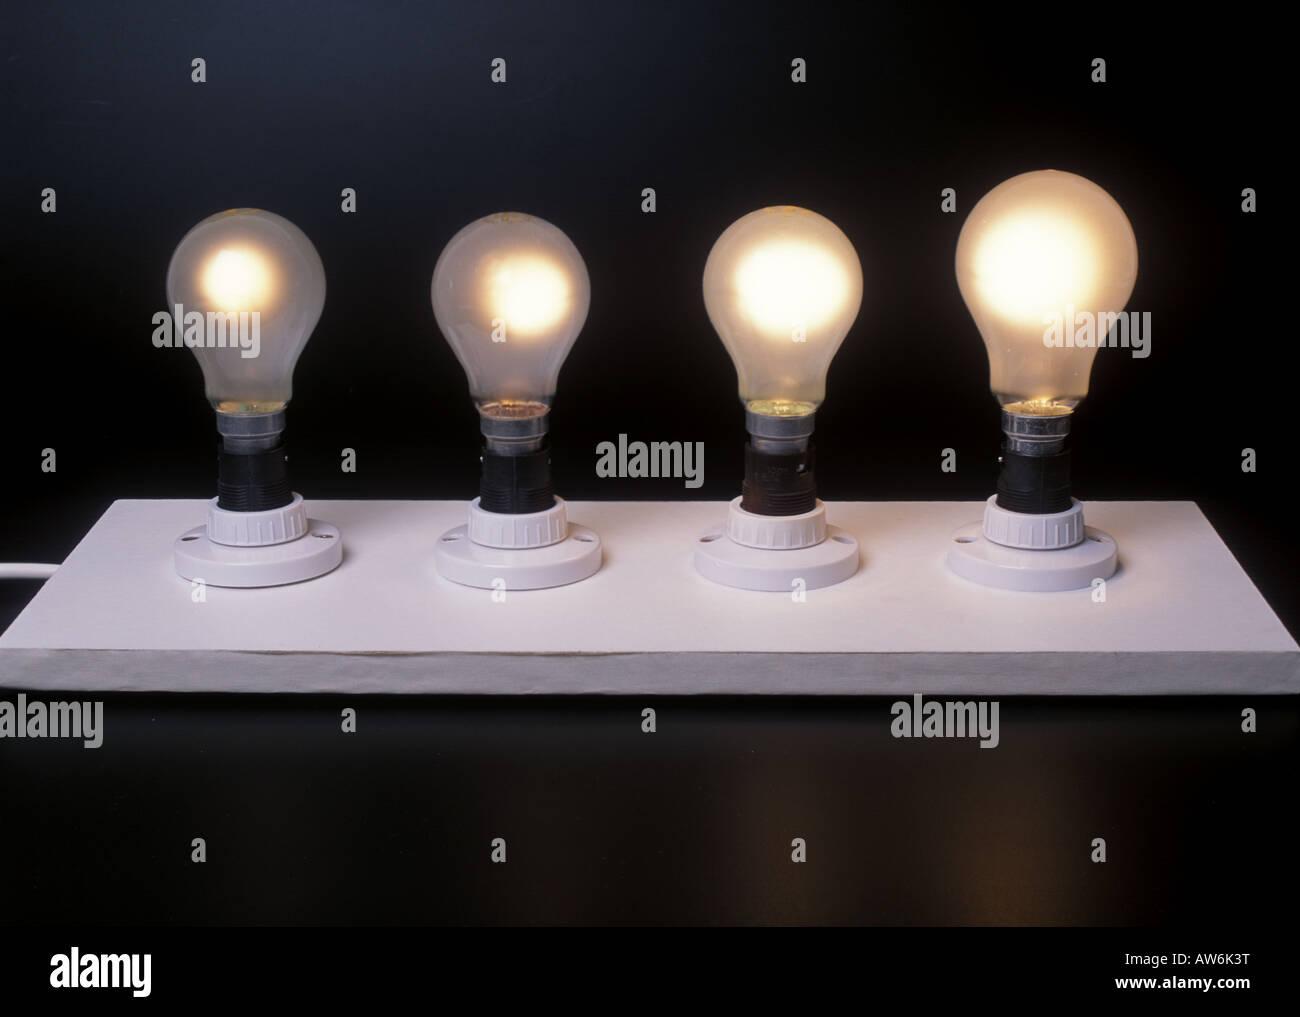 Attractive Four Different Wattage Light Bulbs 40w 60w 100w 150w   Stock Image